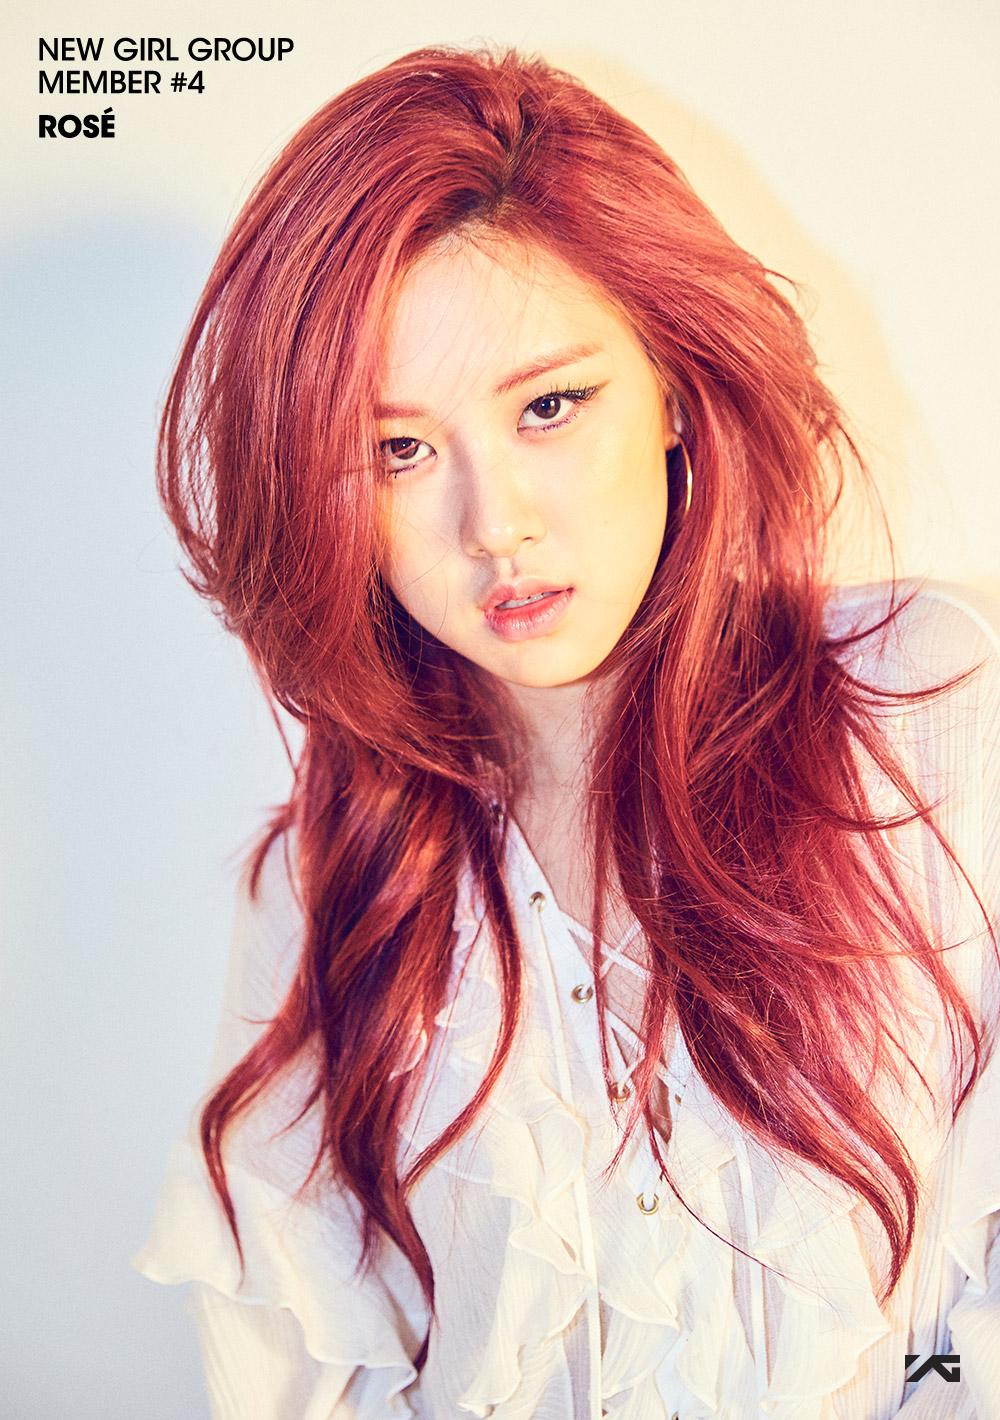 YG revela teasers para Rosé, nueva miembro de su grupo femenino